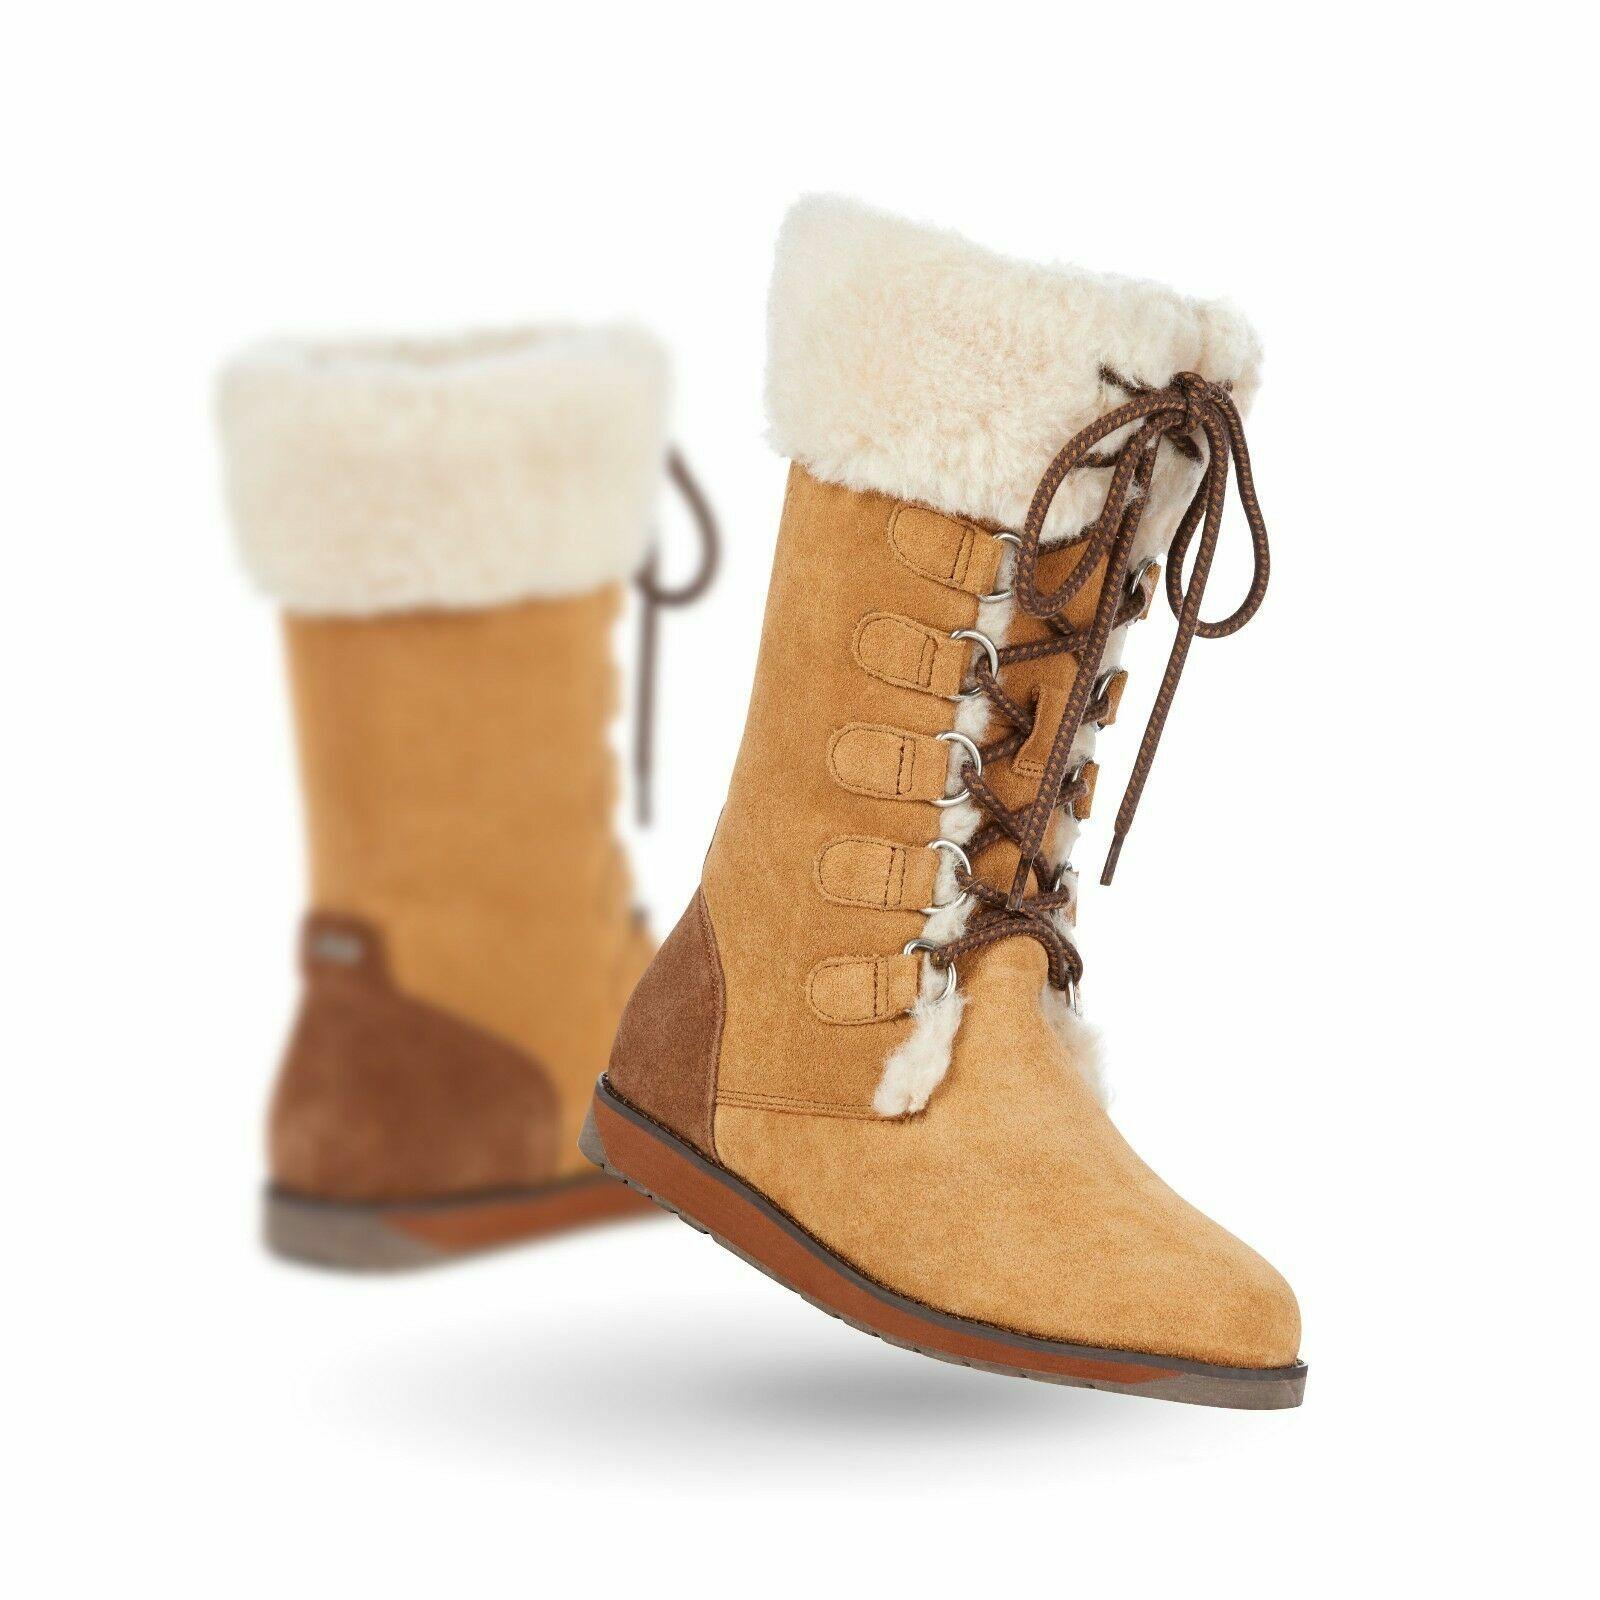 Size 5M NIB Emu Australia Women/'s Featherwood Hi Merino Wool Boots in Chestnut